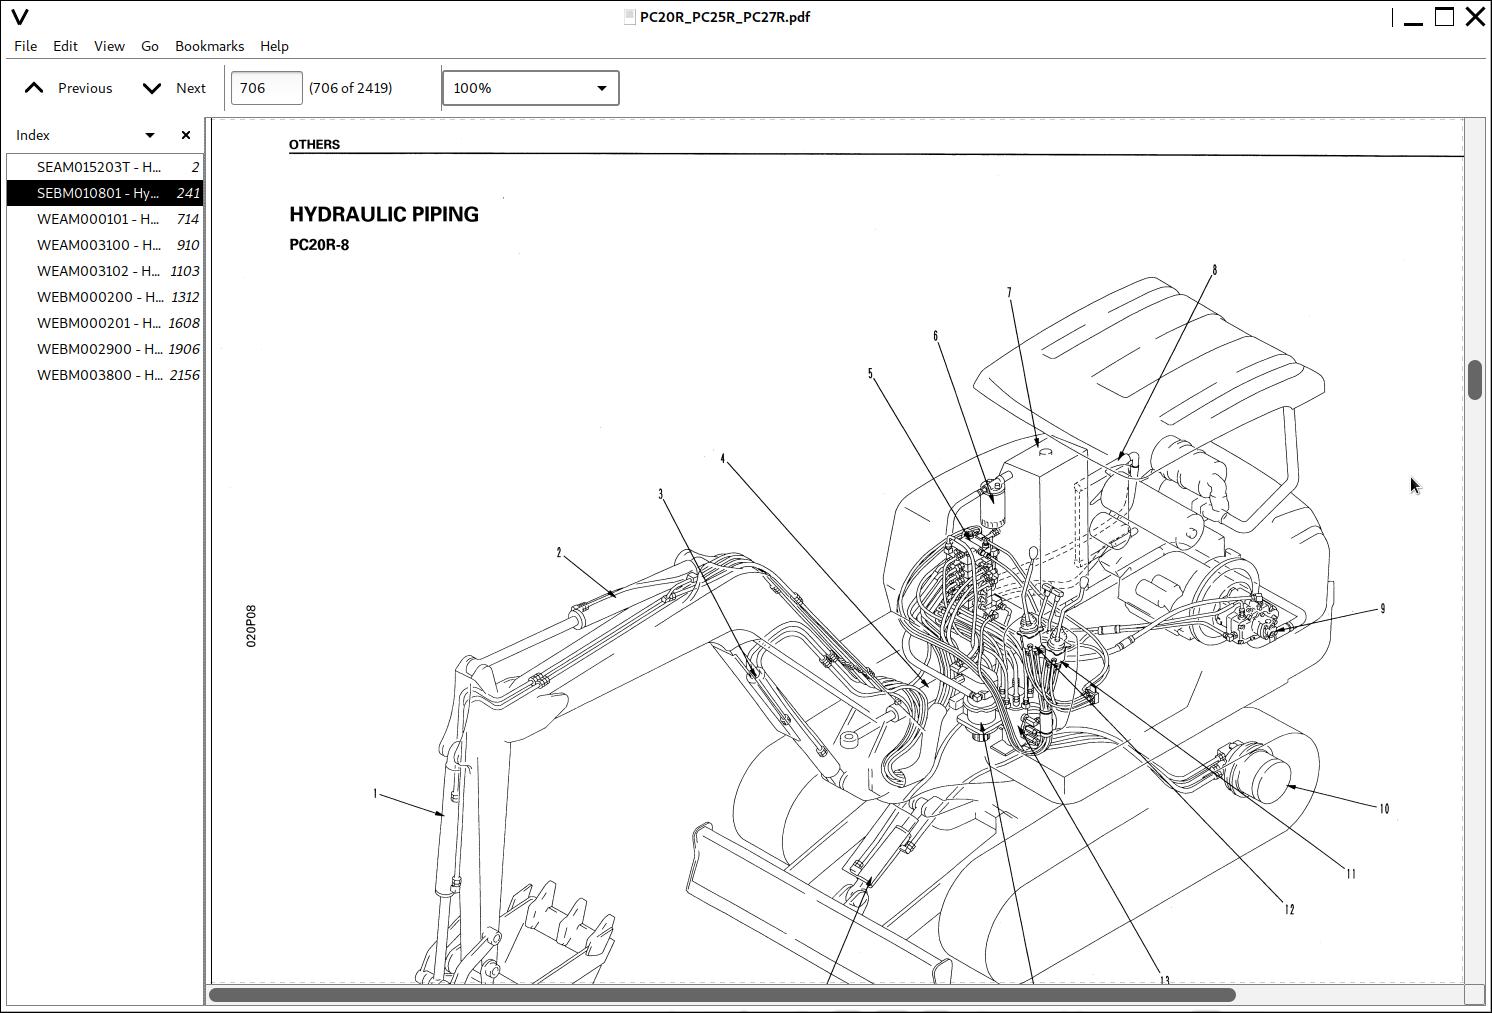 Komatsu Hydraulic Excavator PC20R, PC25R, PC27R Repair